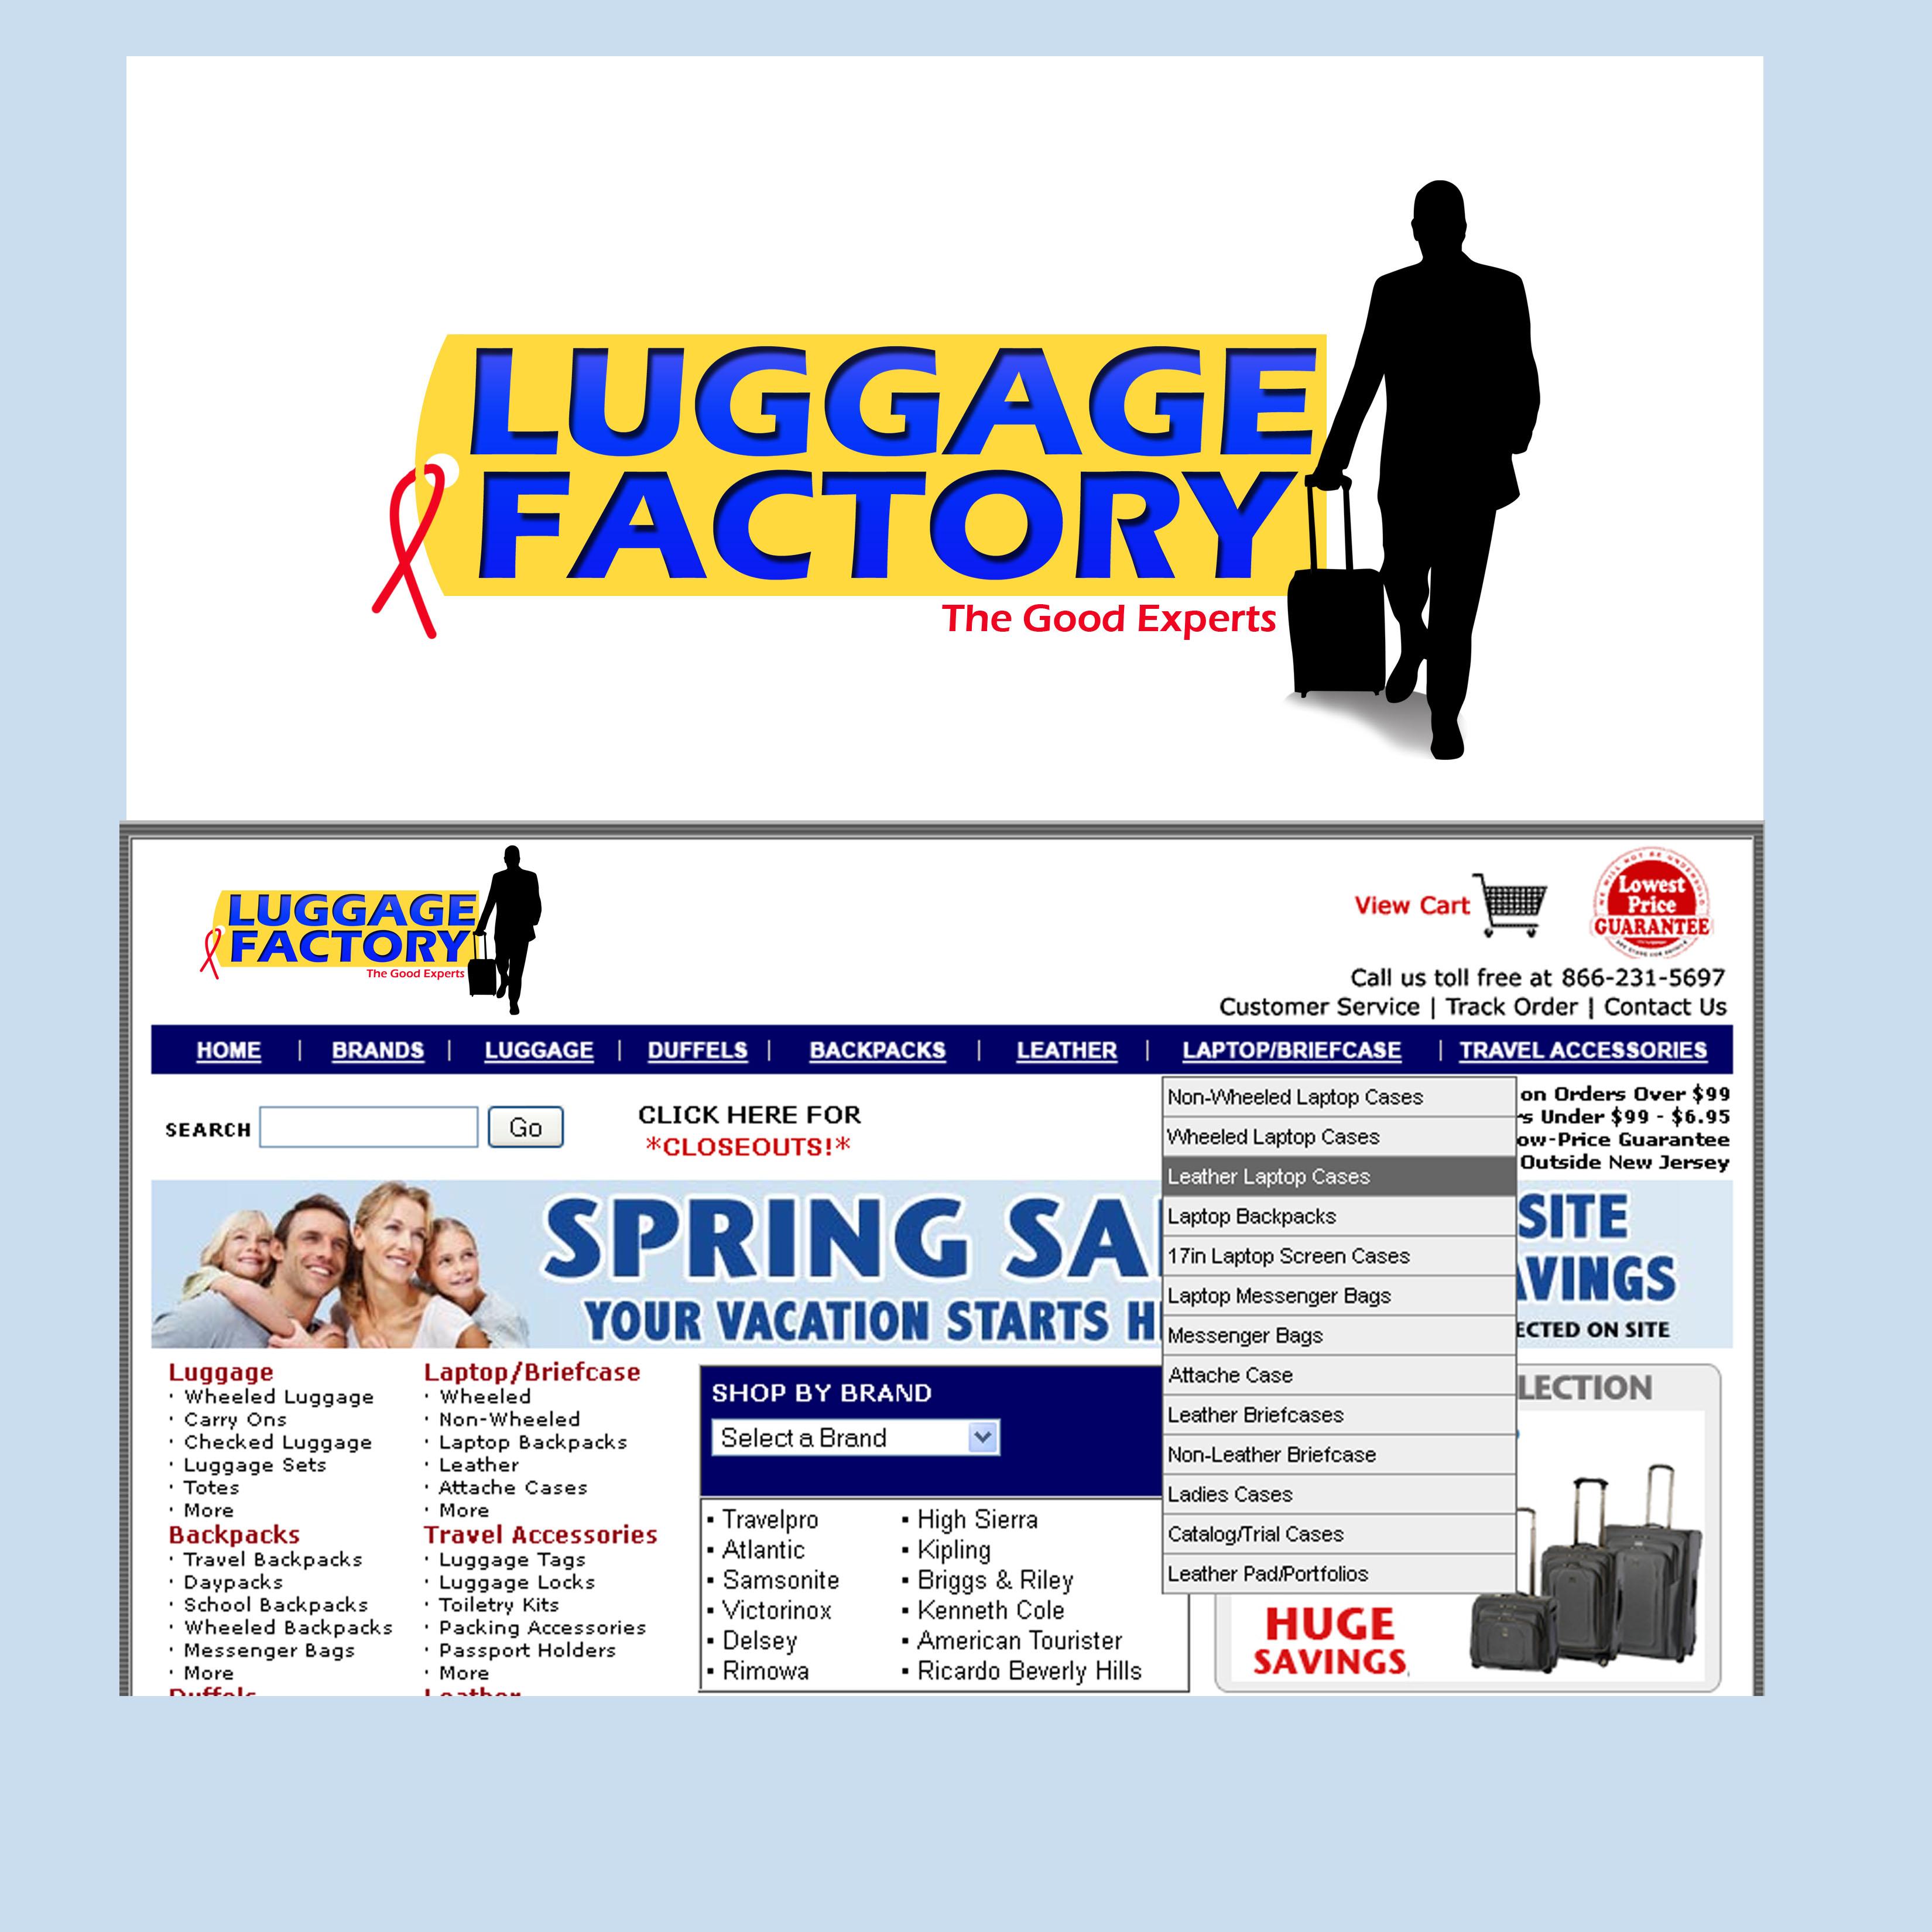 Logo Design by Allan Esclamado - Entry No. 109 in the Logo Design Contest Creative Logo Design for Luggage Factory.